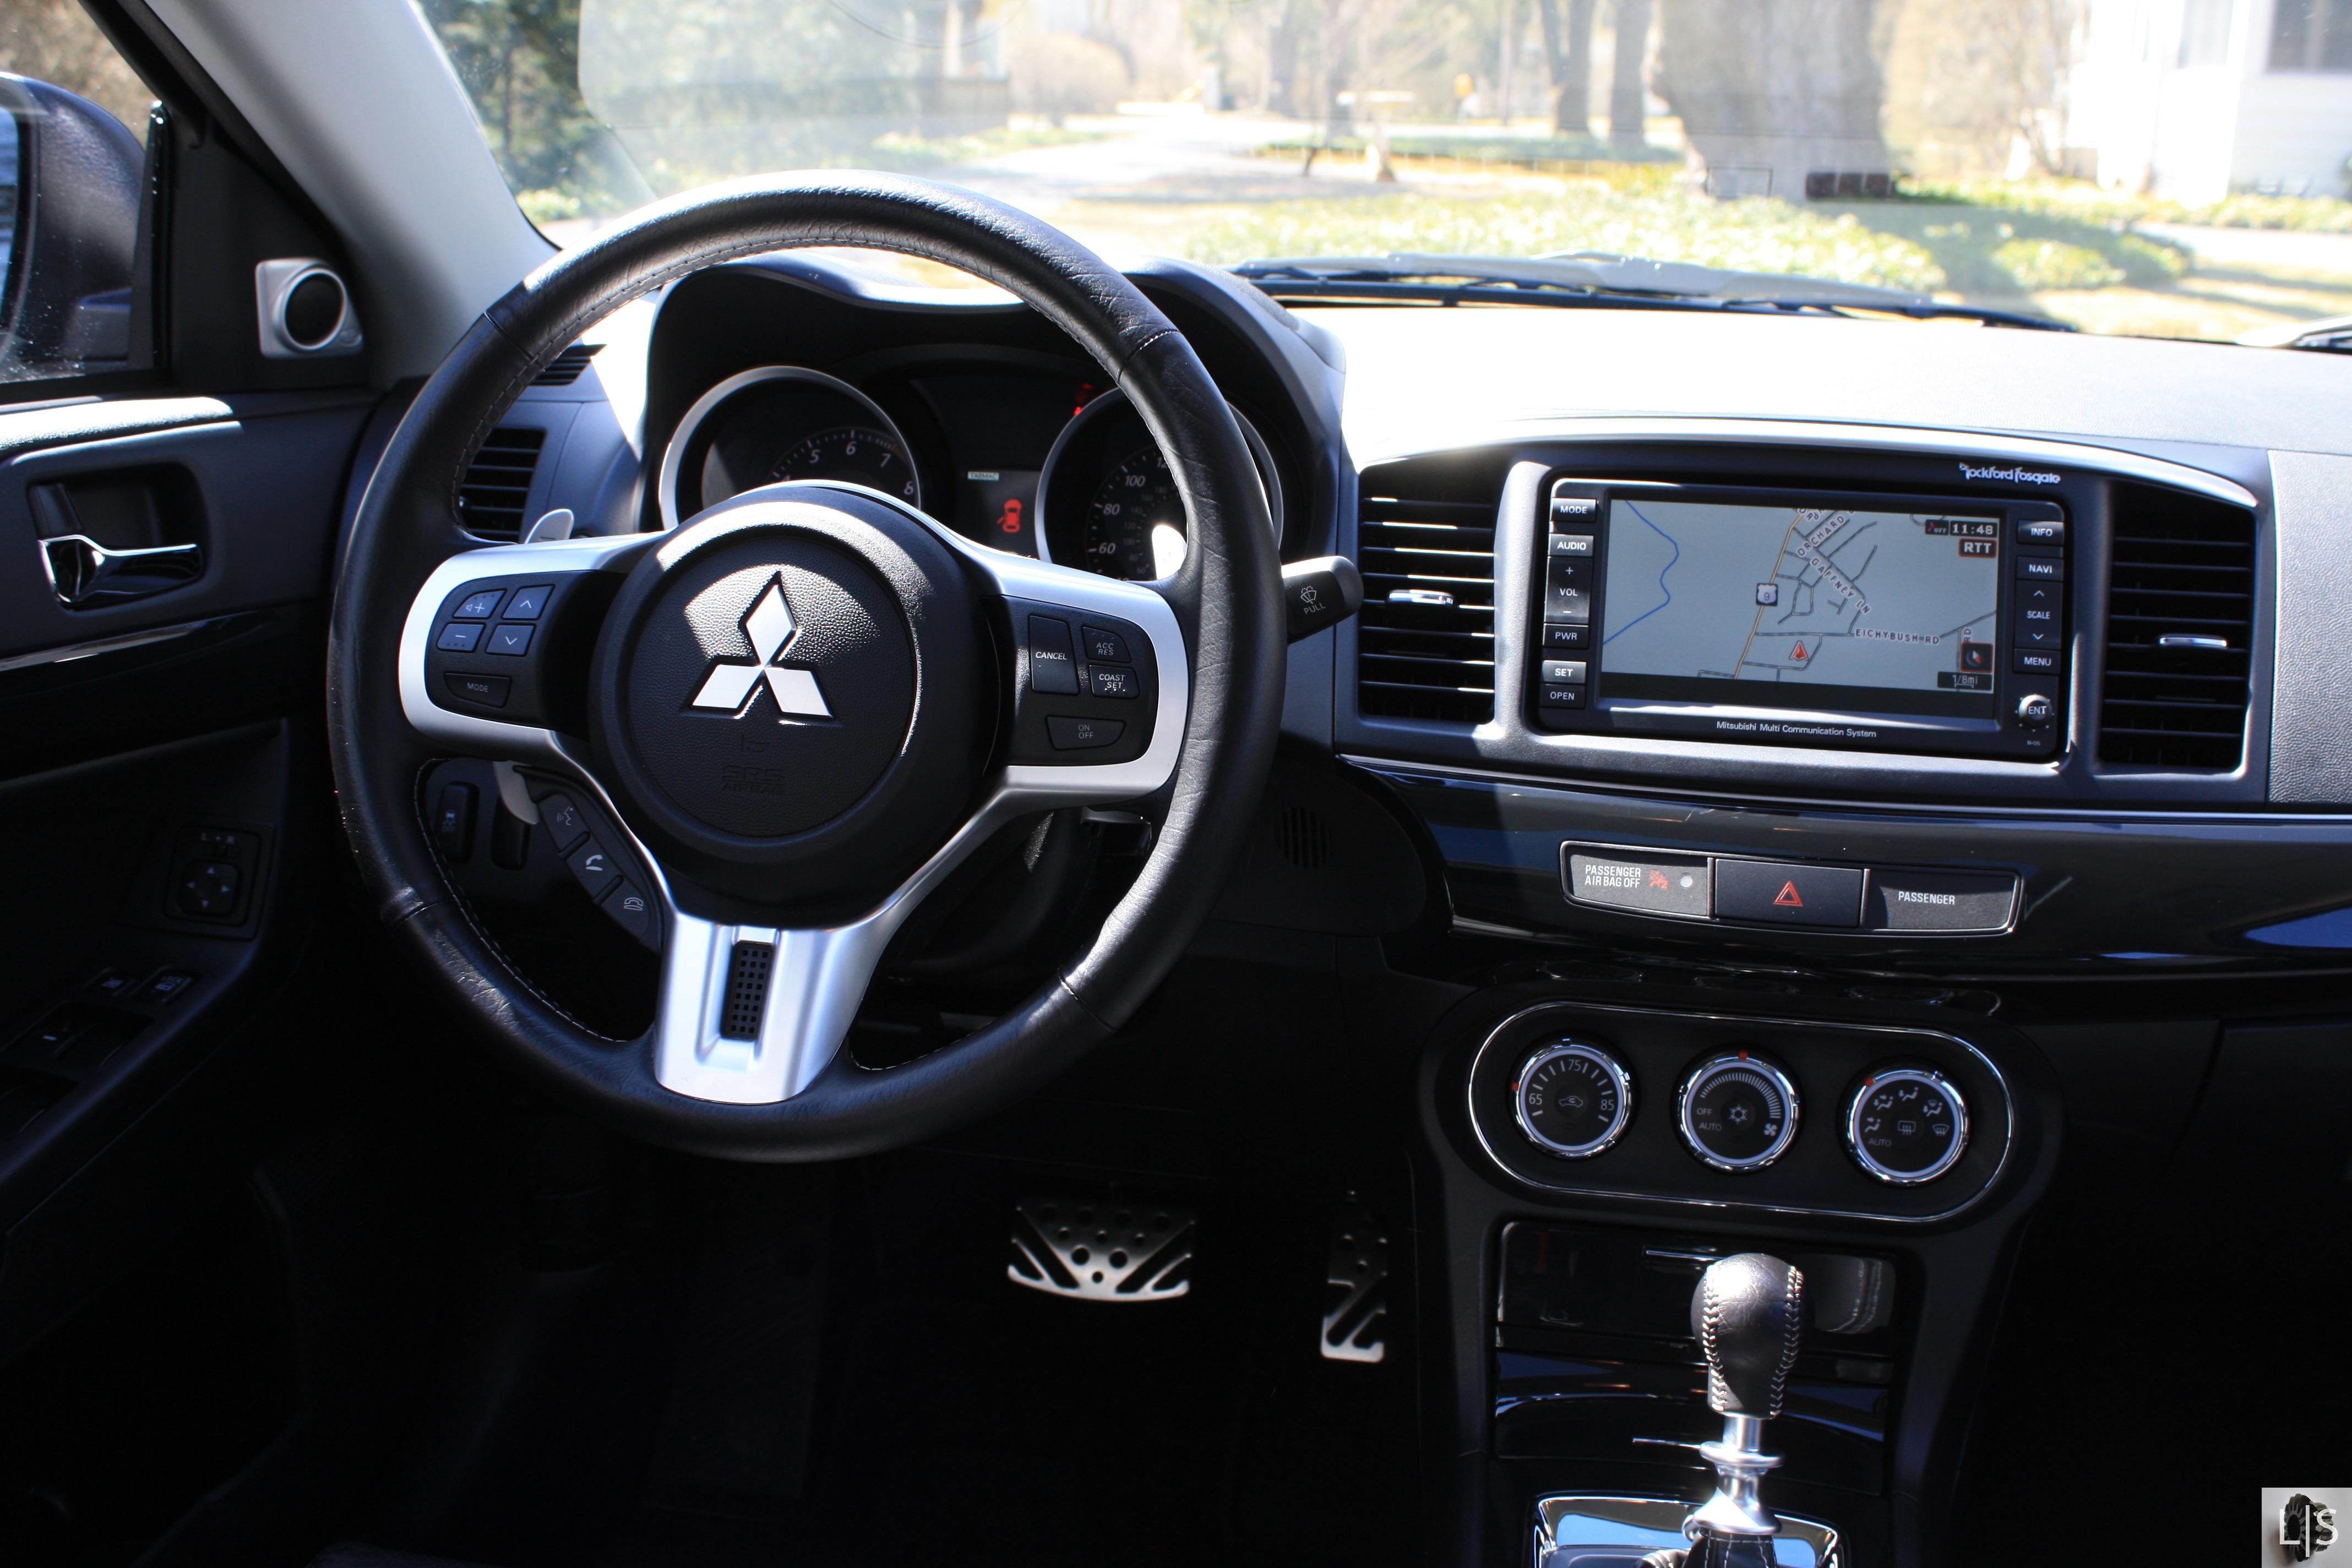 4272 2848 in 2013 mitsubishi lancer evolution mr - Mitsubishi Evo Interior 2013